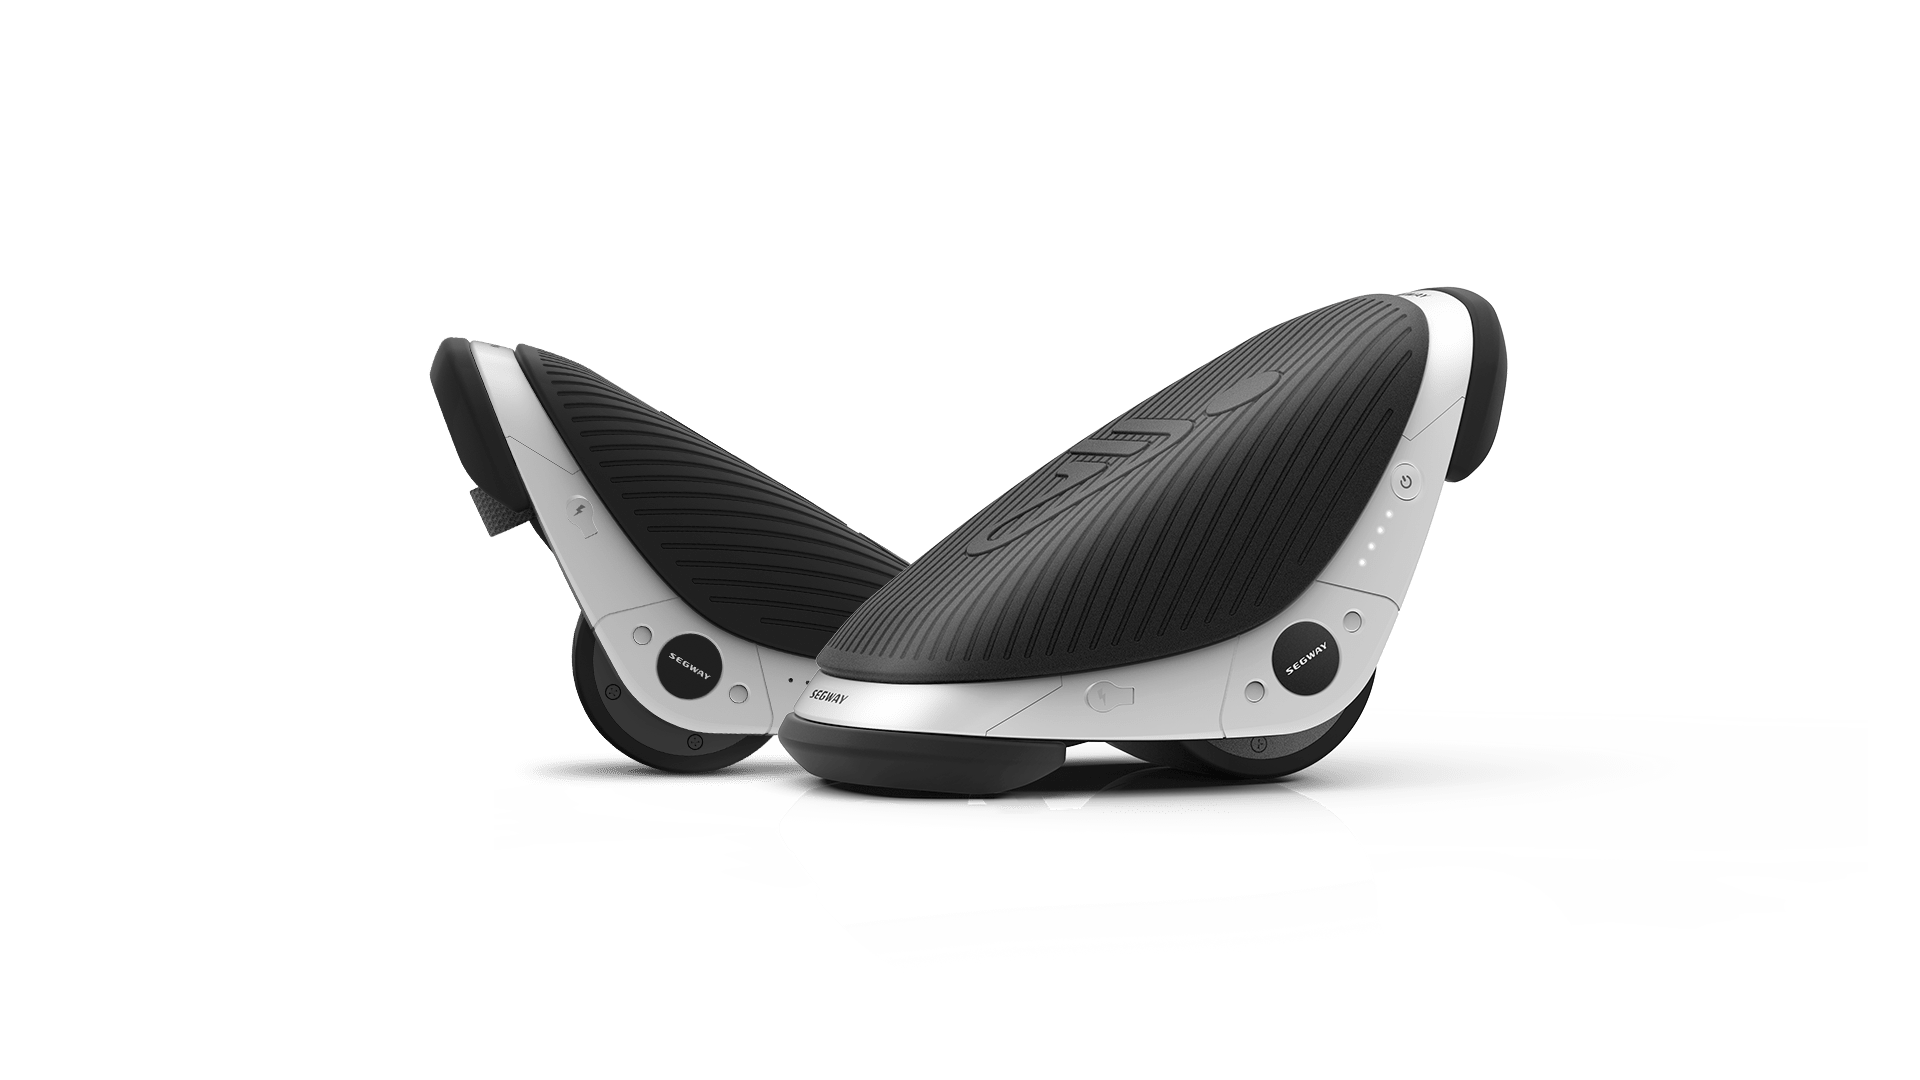 Электроролики Segway Drift W1 от компании Segway&Ninebot.